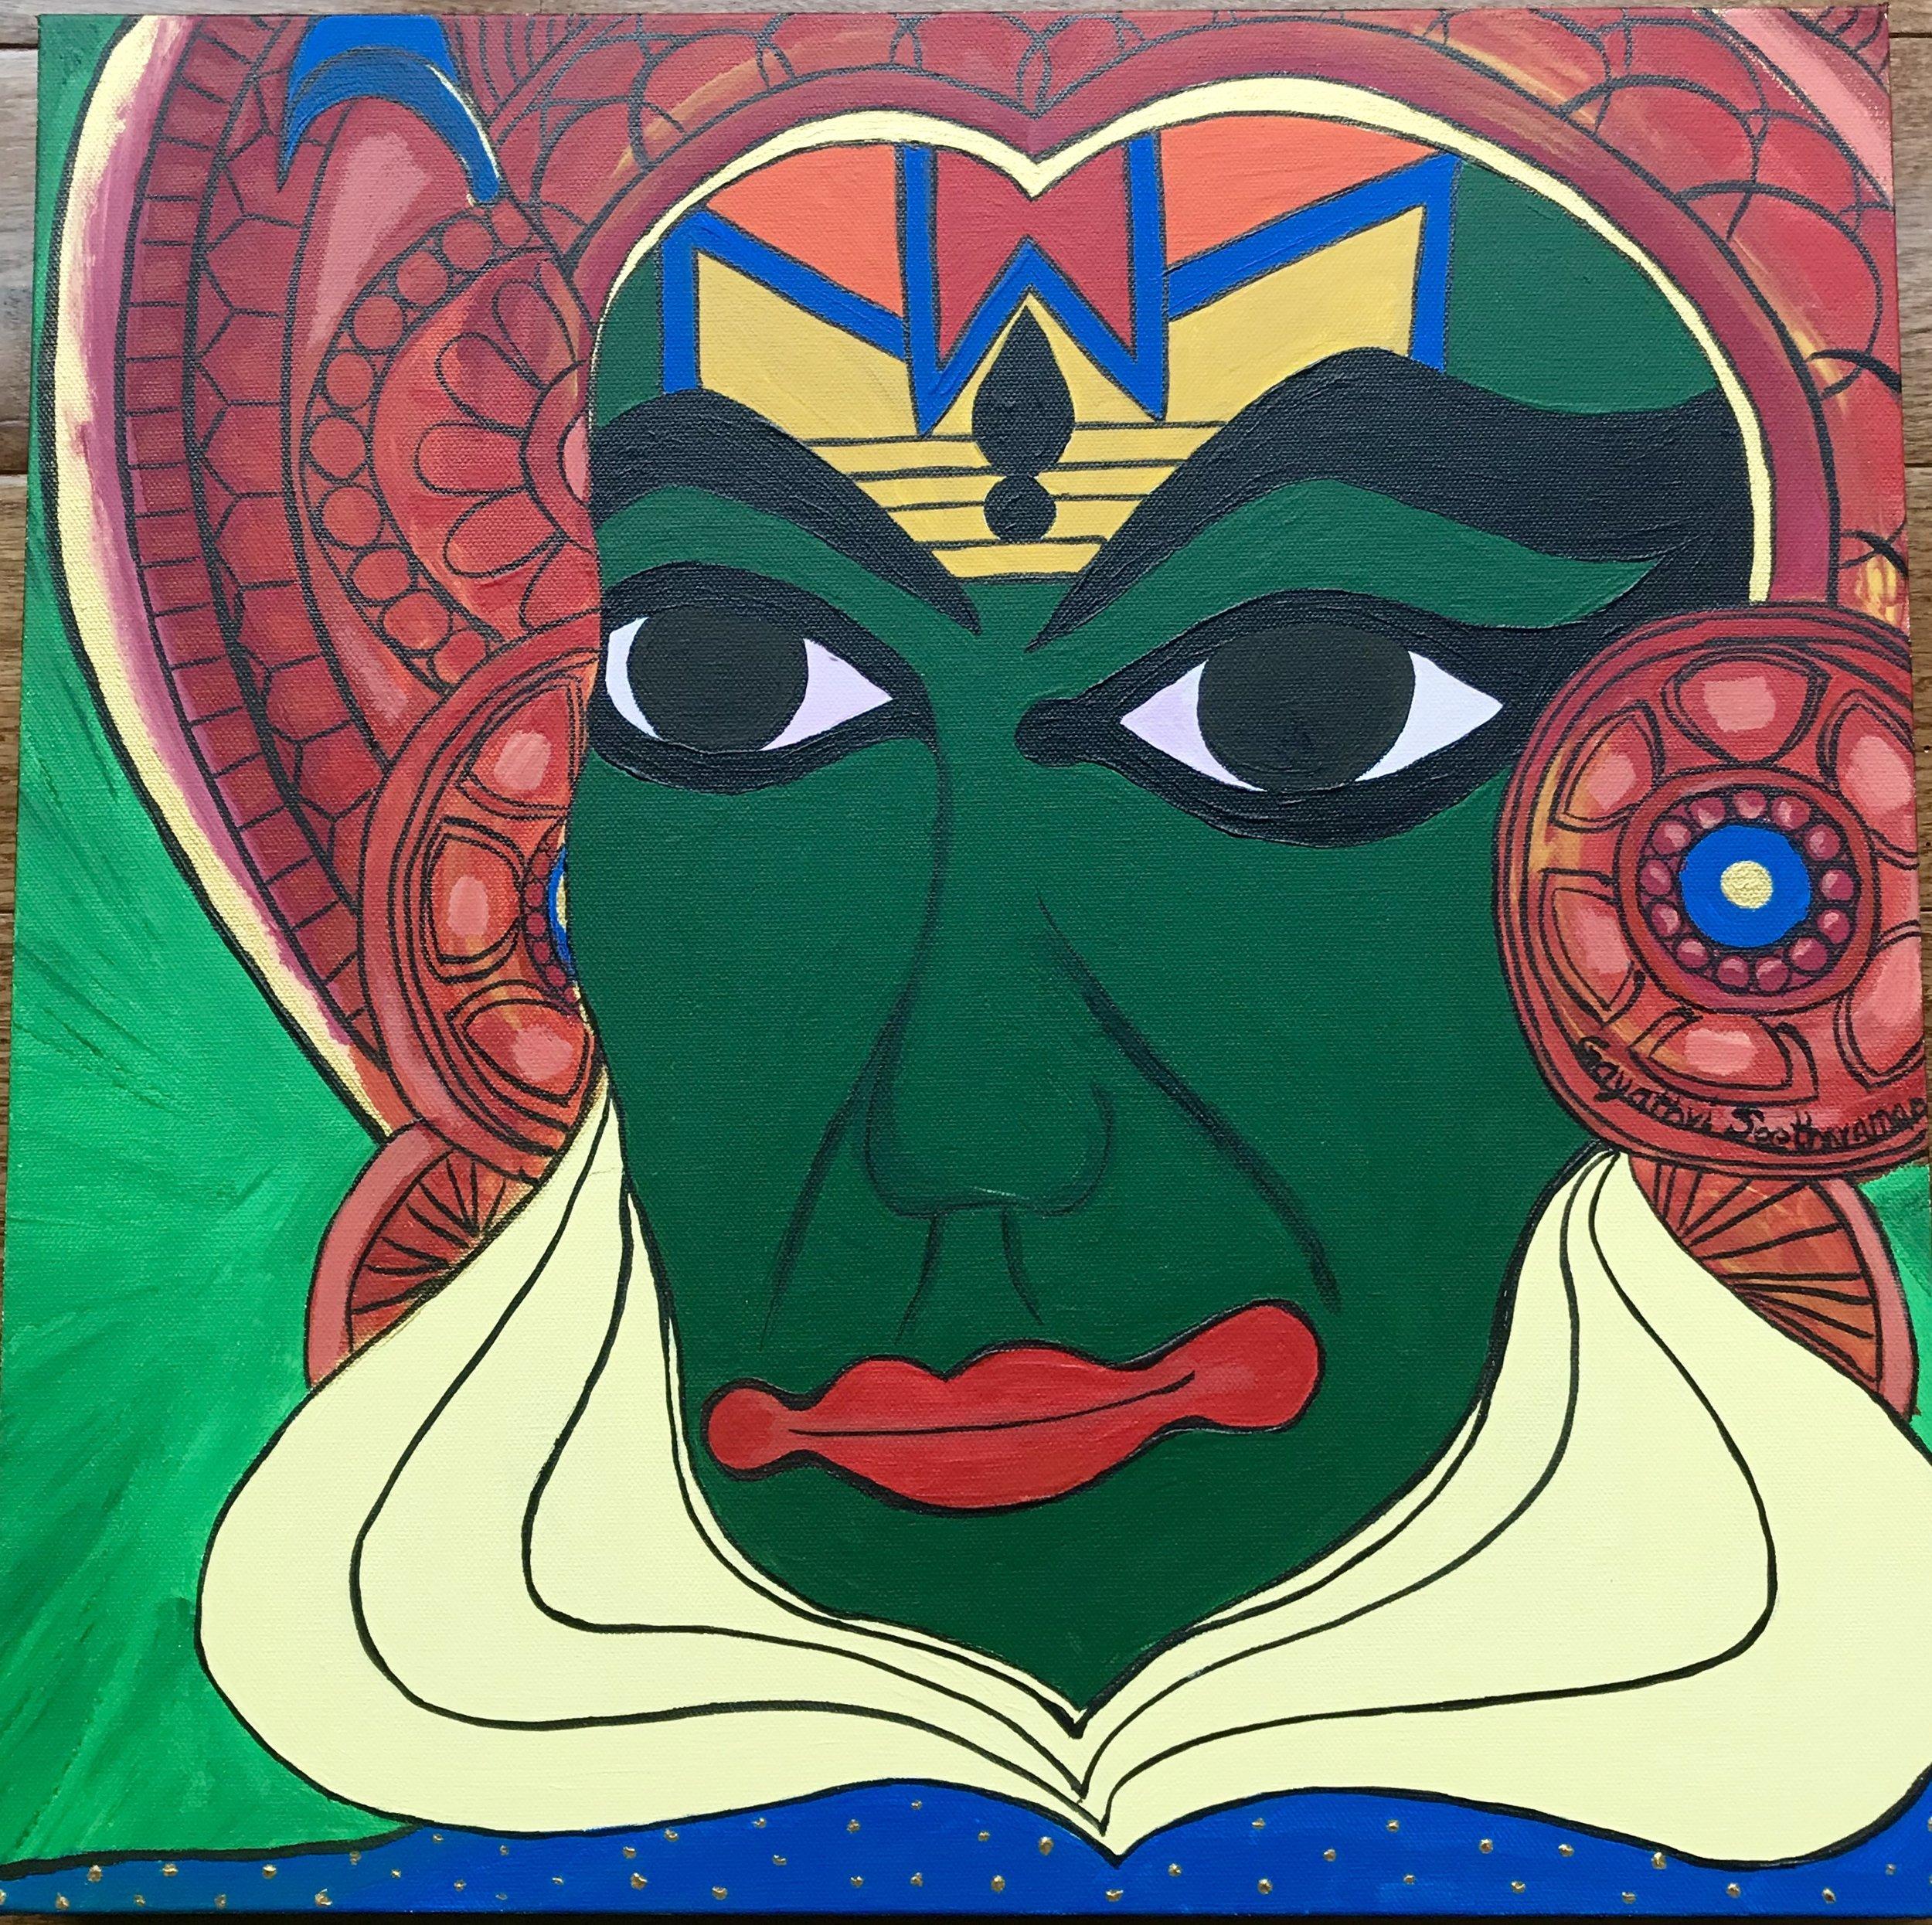 Rama - Painted Face of Kathakali Dancer, Gayathri Seetharaman